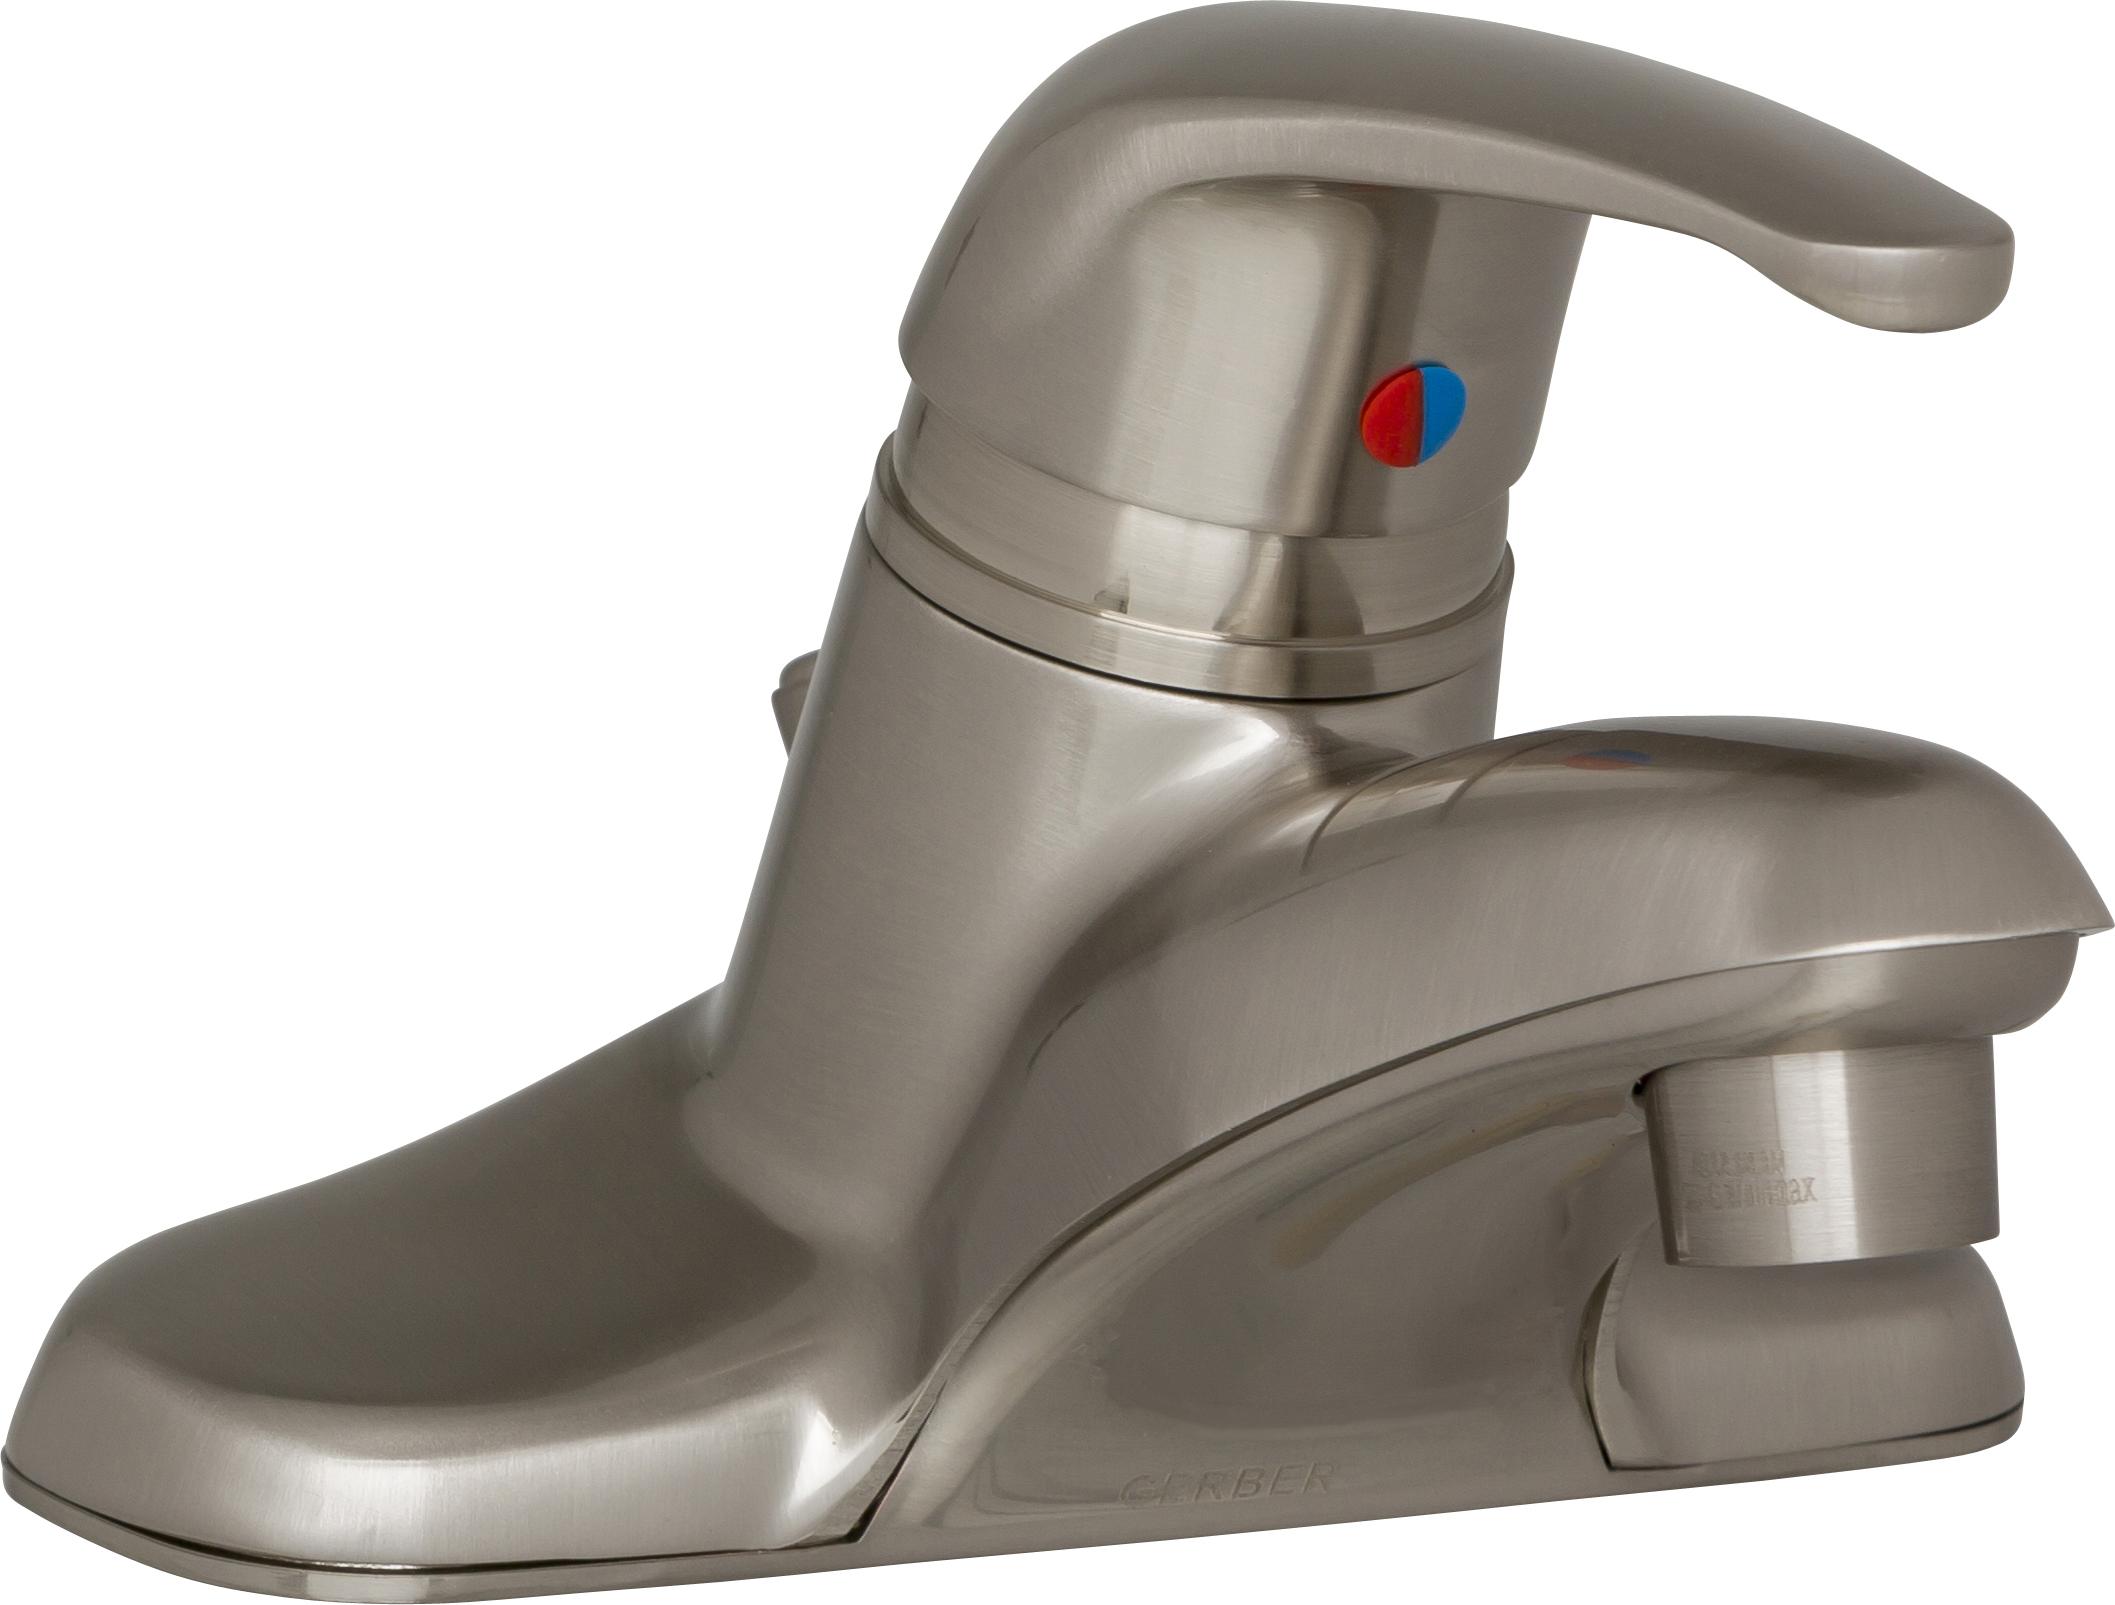 Maxwell 174 Single Handle Bathroom Faucet Gerber Plumbing